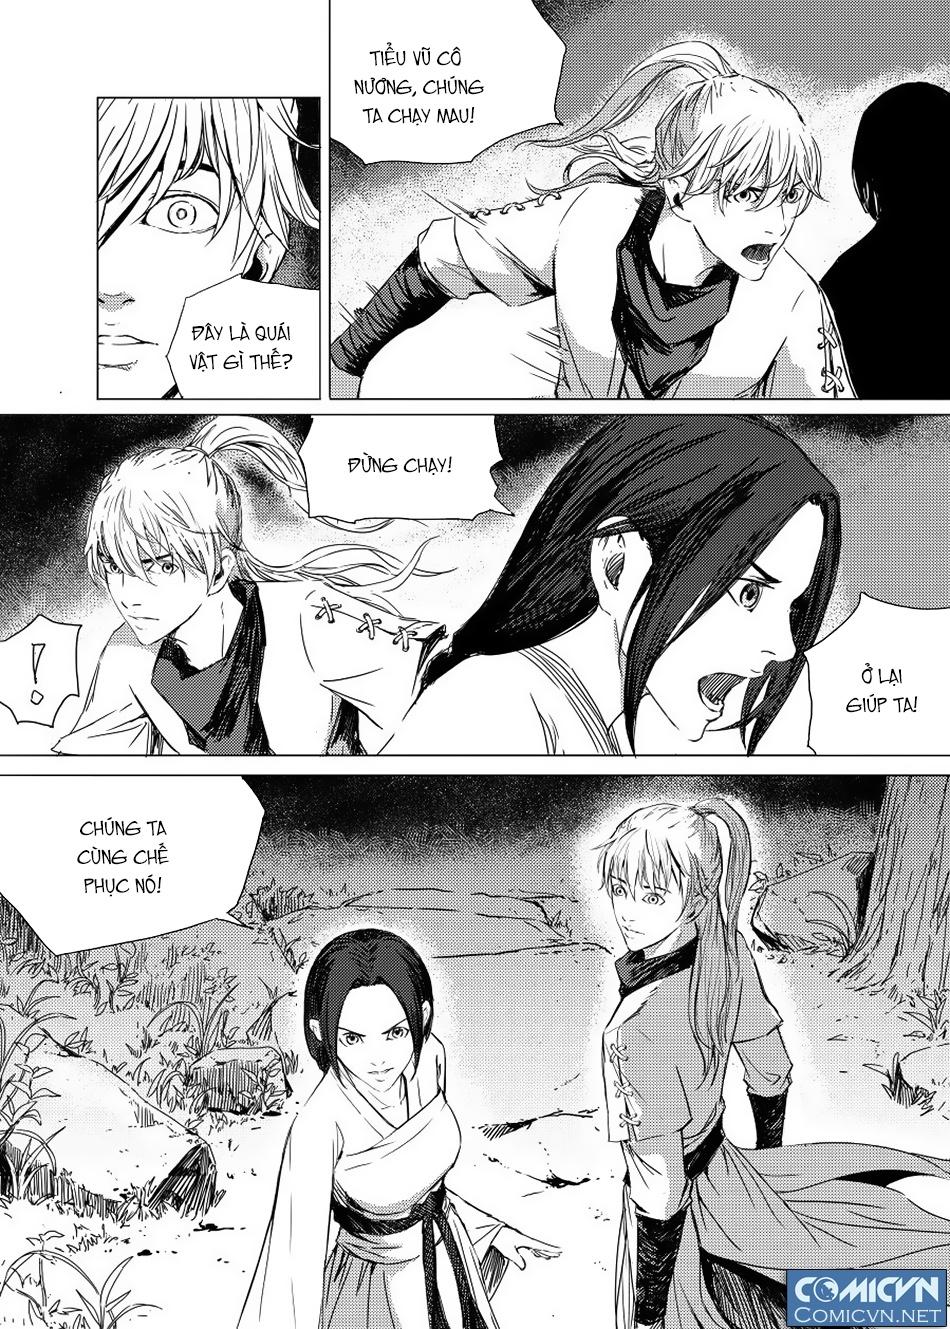 Quỷ Sai Chapter 17 - Hamtruyen.vn